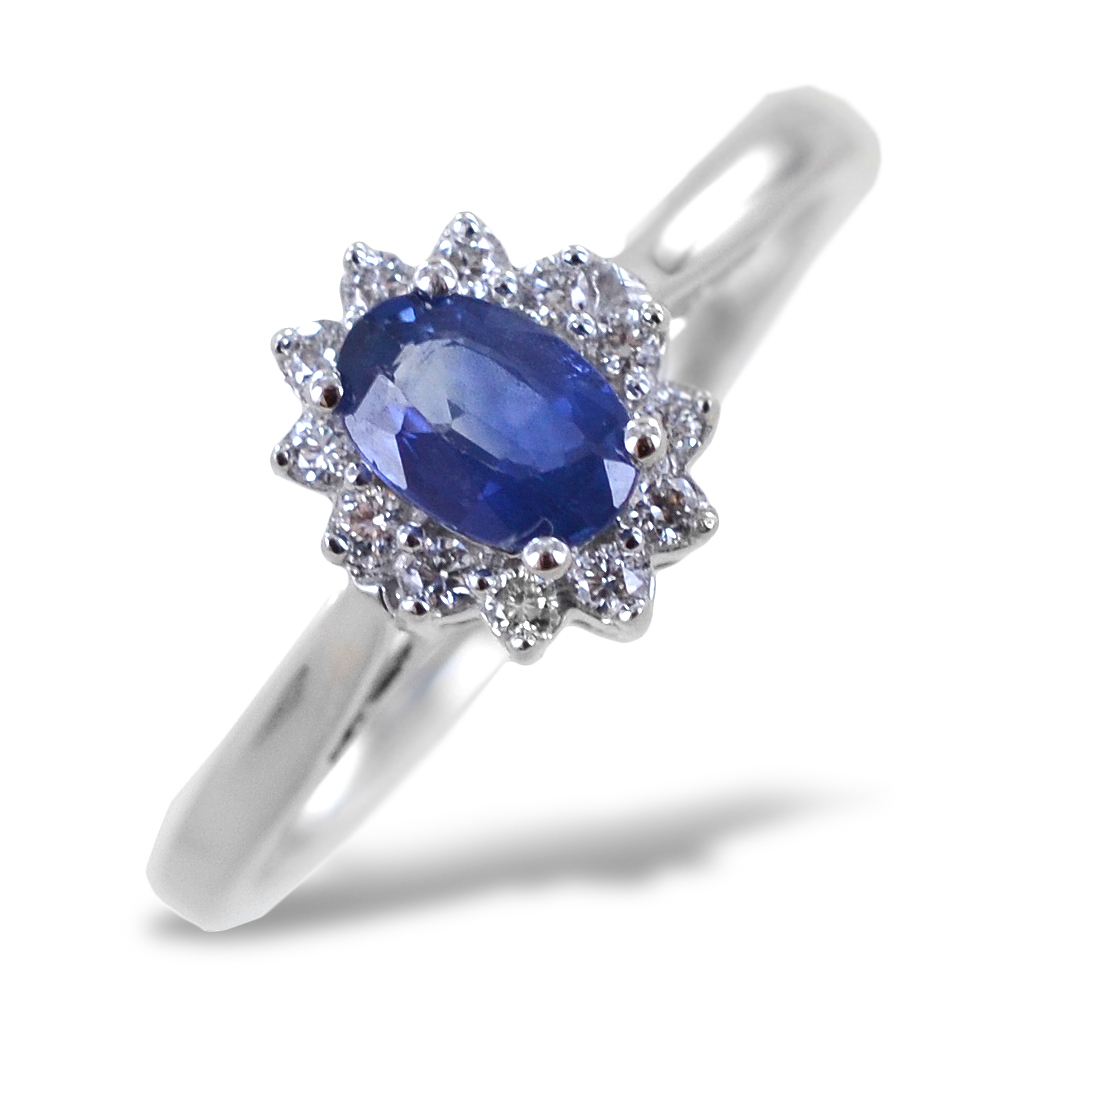 Anello Zaffiro Rosetta diamanti modello Maharaja Gioielli Raaja